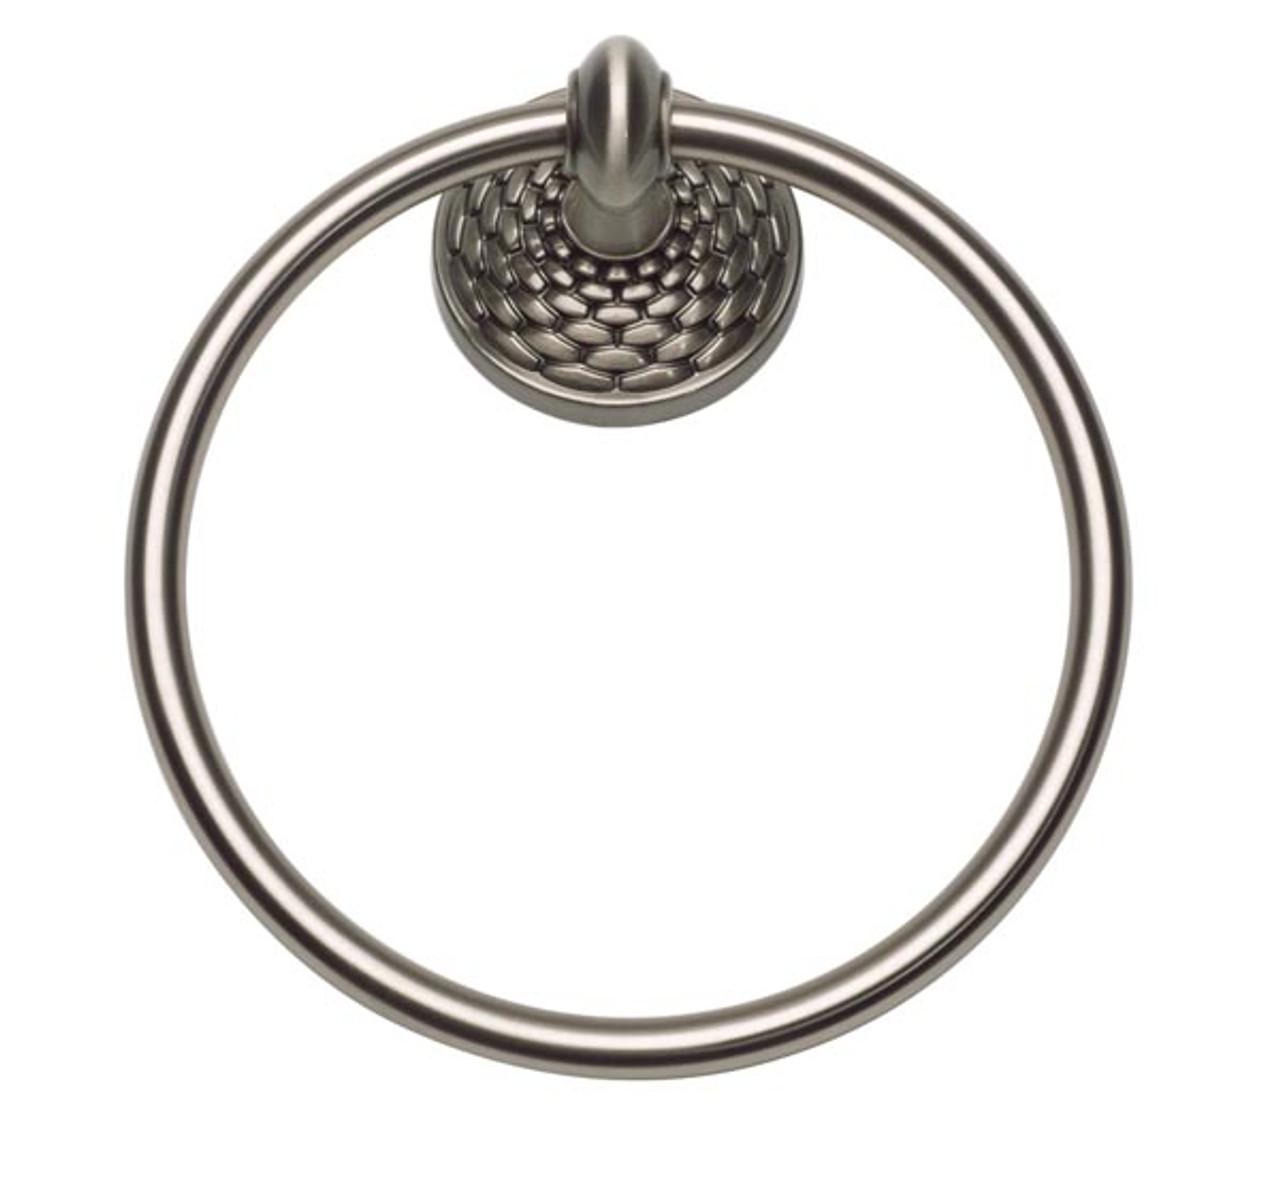 Mandalay Brushed Nickel 6.75 In Towel Ring